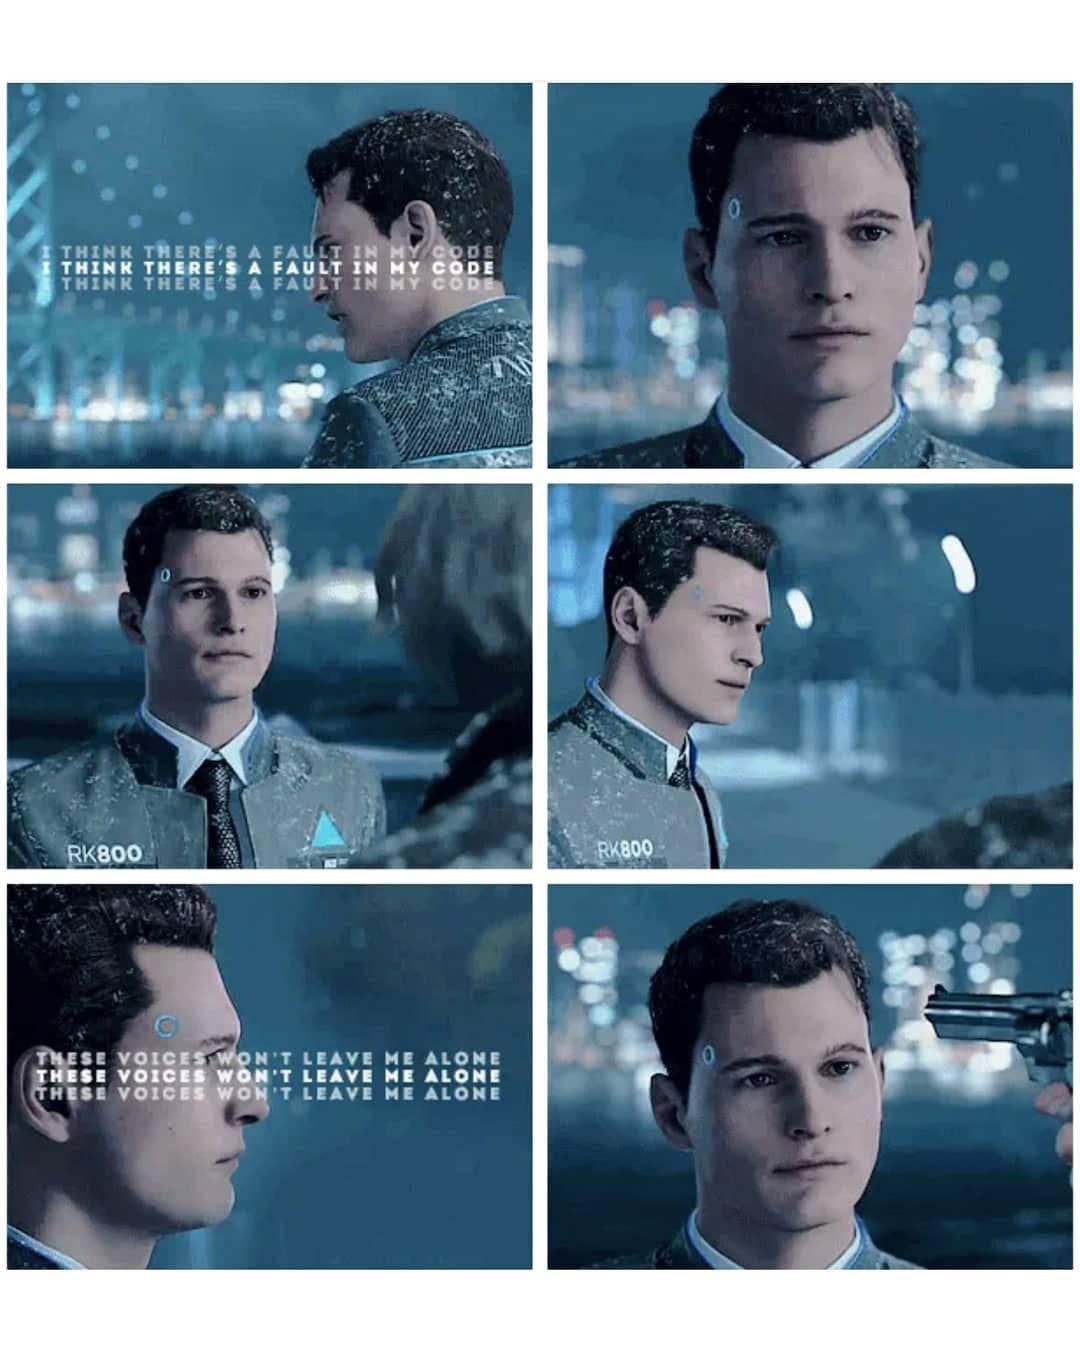 I love one (1) #android sent by #cyberlife  #bryandechart#detroitbecomehuman#detroitbecomehumanedit#detroitbecomehumanps4#detroitbecomehumanconnor#dbh#ps4#videogame#videogames#androids#futuristic#davidcage#edit#quote#quanticdreams#sony#e3#e32018#connor#connordetroitbecomehuman#rk800#rk800connor#rk900#cyberpunk#cyber#scifi#gamer